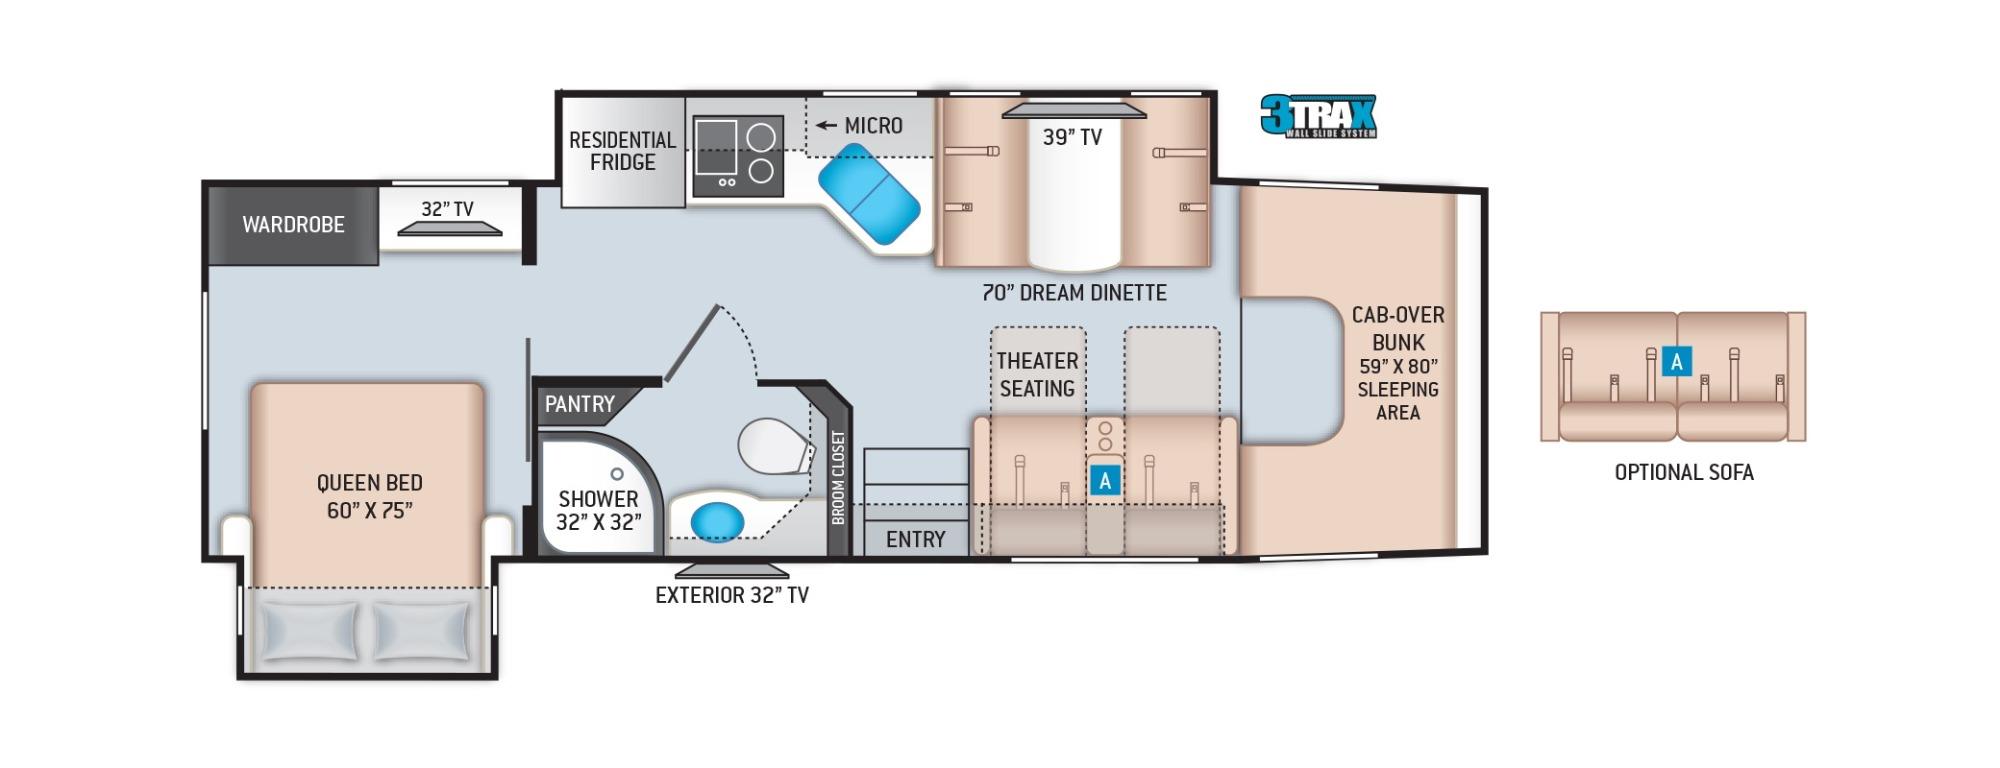 View Floor Plan for 2022 THOR OMNI XG32